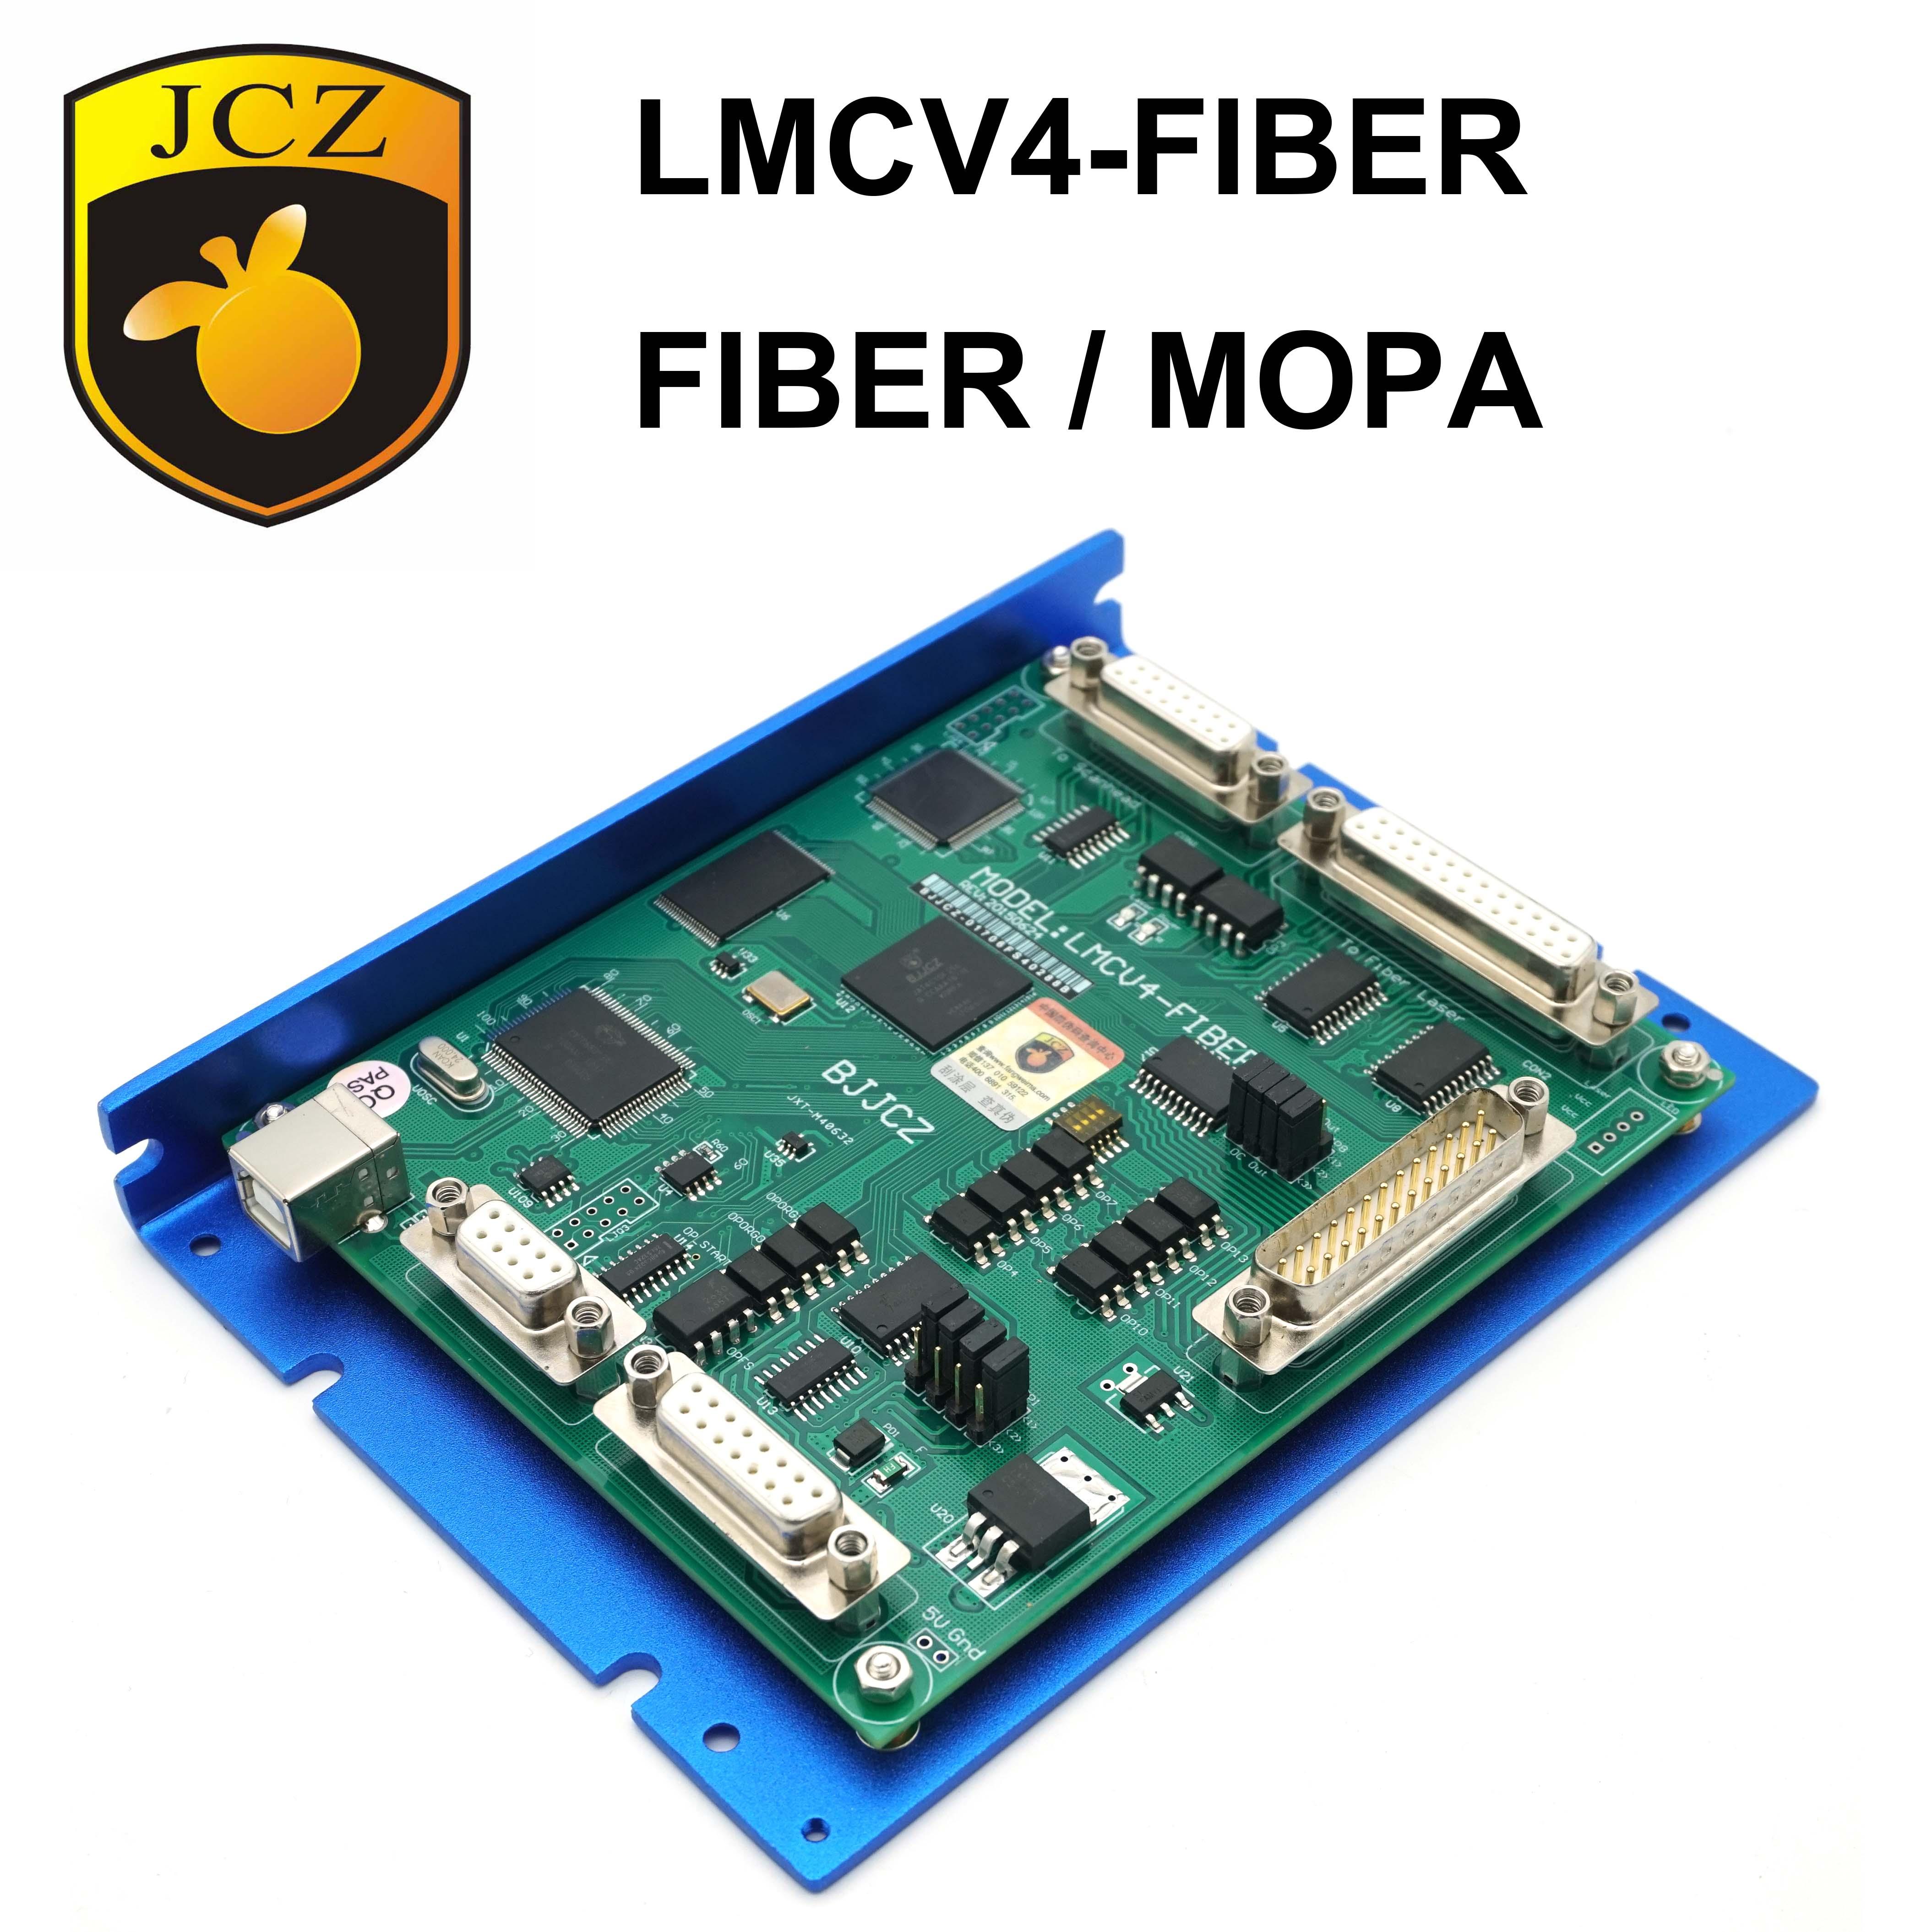 Free Shipping JCZ BJJCZ LMCV4-FIBER Fiber DPSS EzCAD2 Laser Marking Card